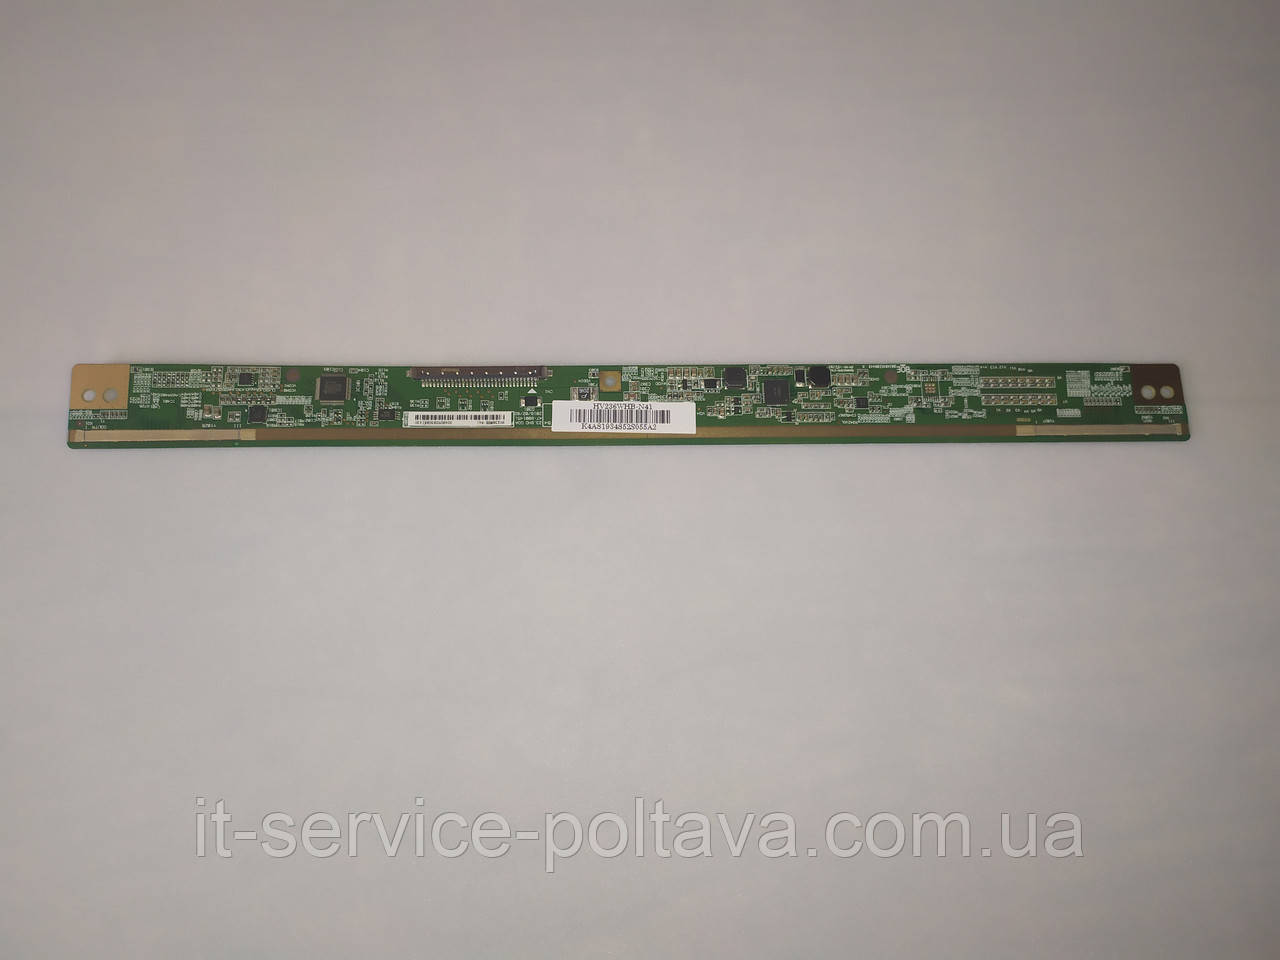 Плата (T-con)  HV236WHB-N41, 23.6HD G0A, 47-6001451 для телевізора XIAOMI